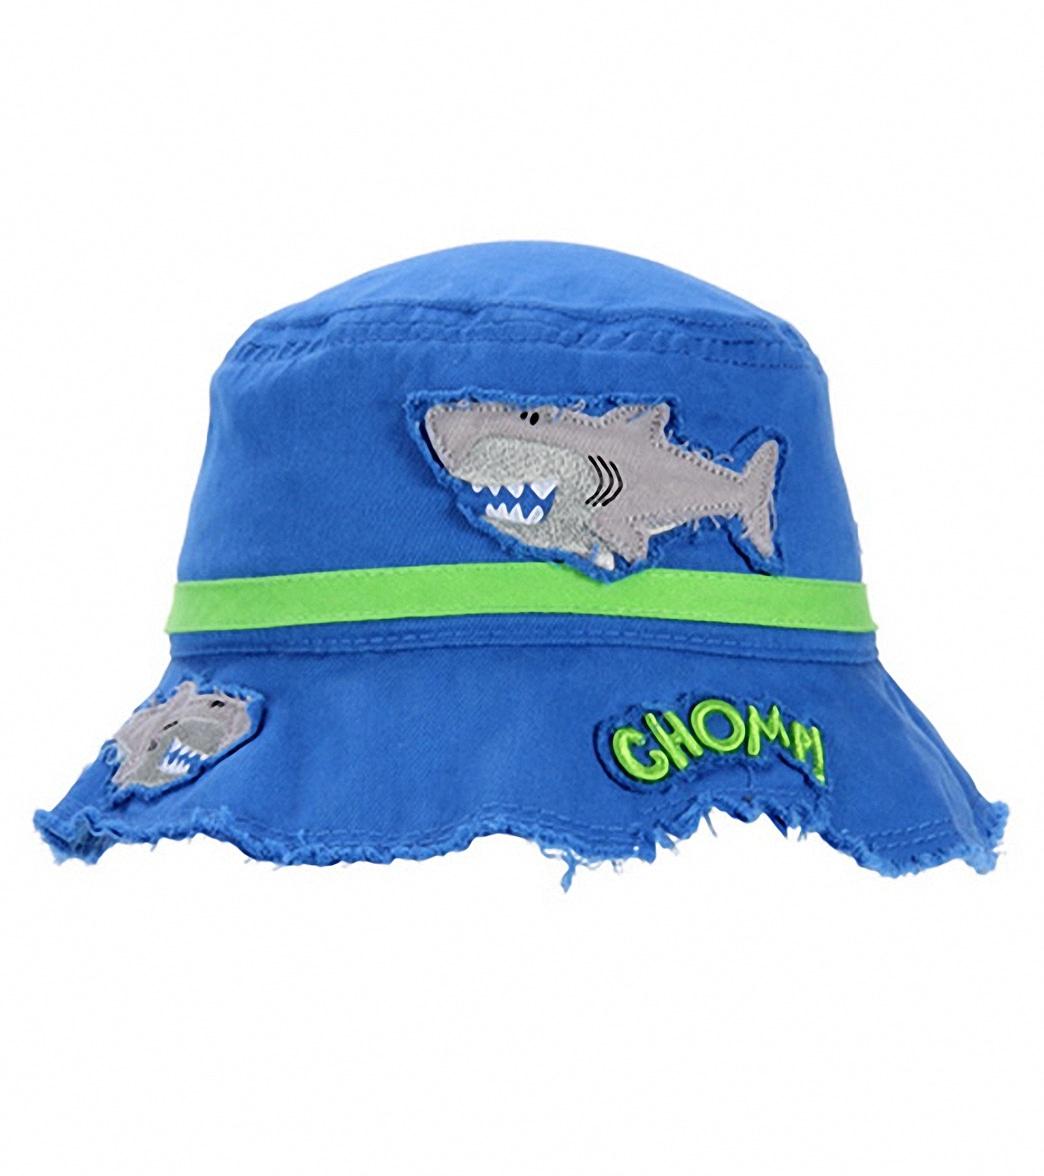 Stephen Joseph Kids  Shark Bucket Hat at SwimOutlet.com 3764aae11cc